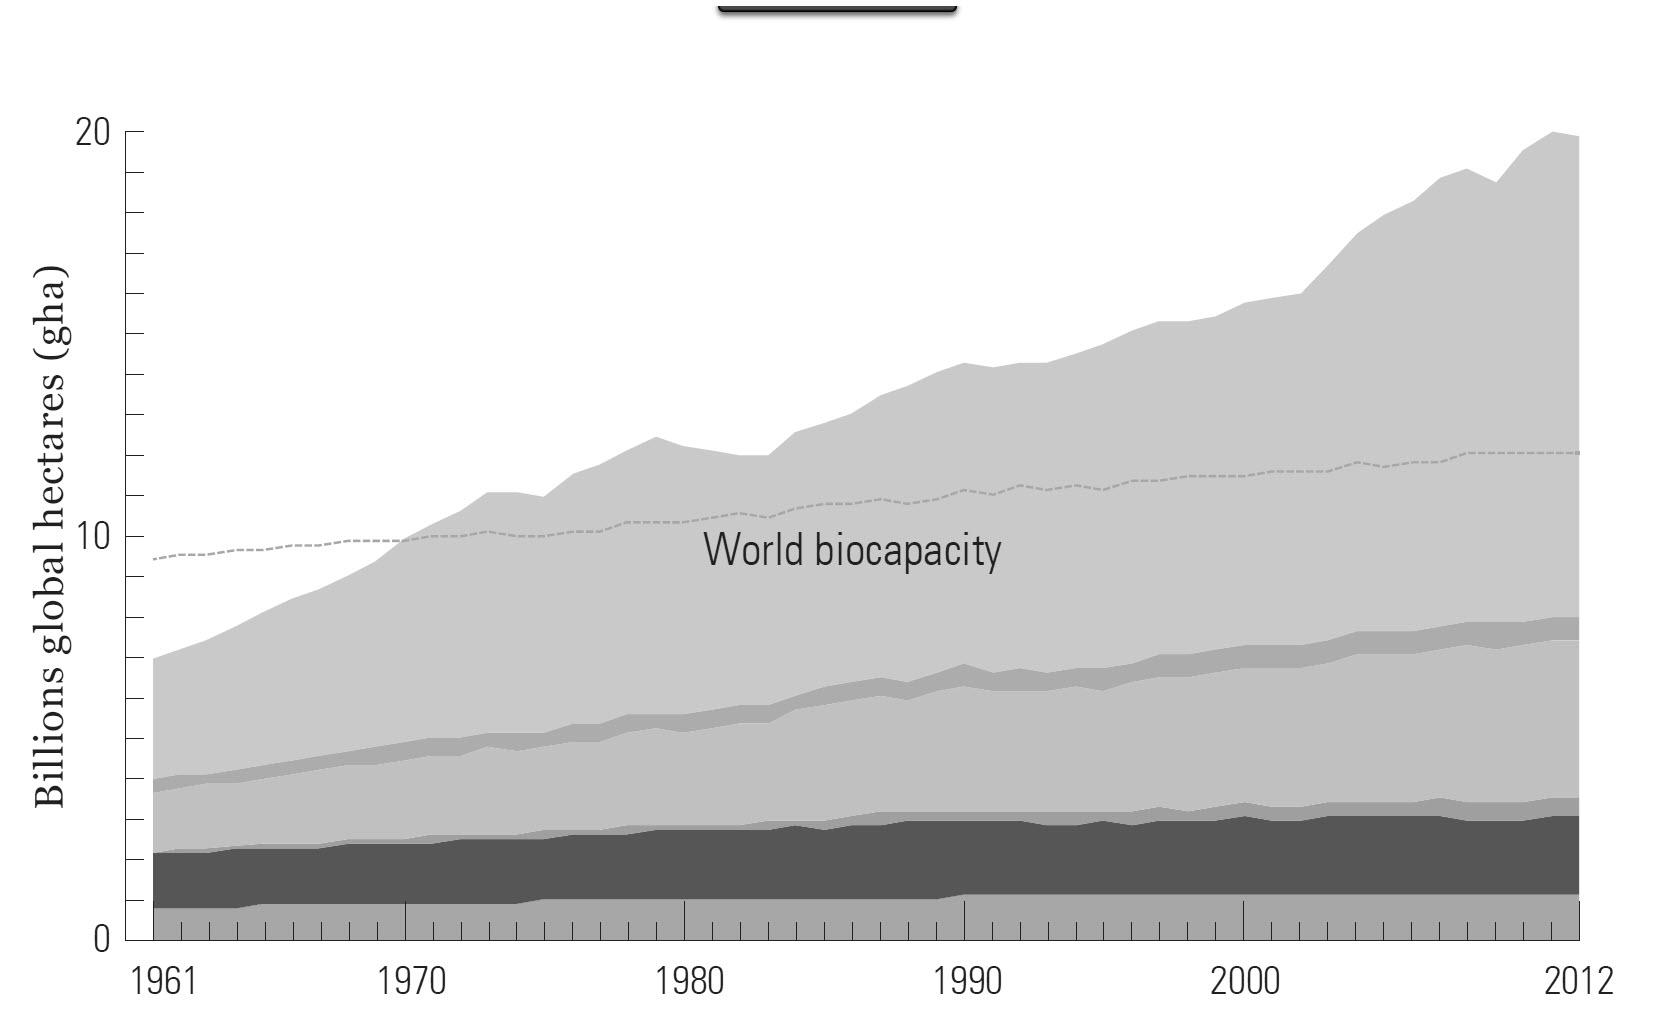 world-biocapacity-p-75